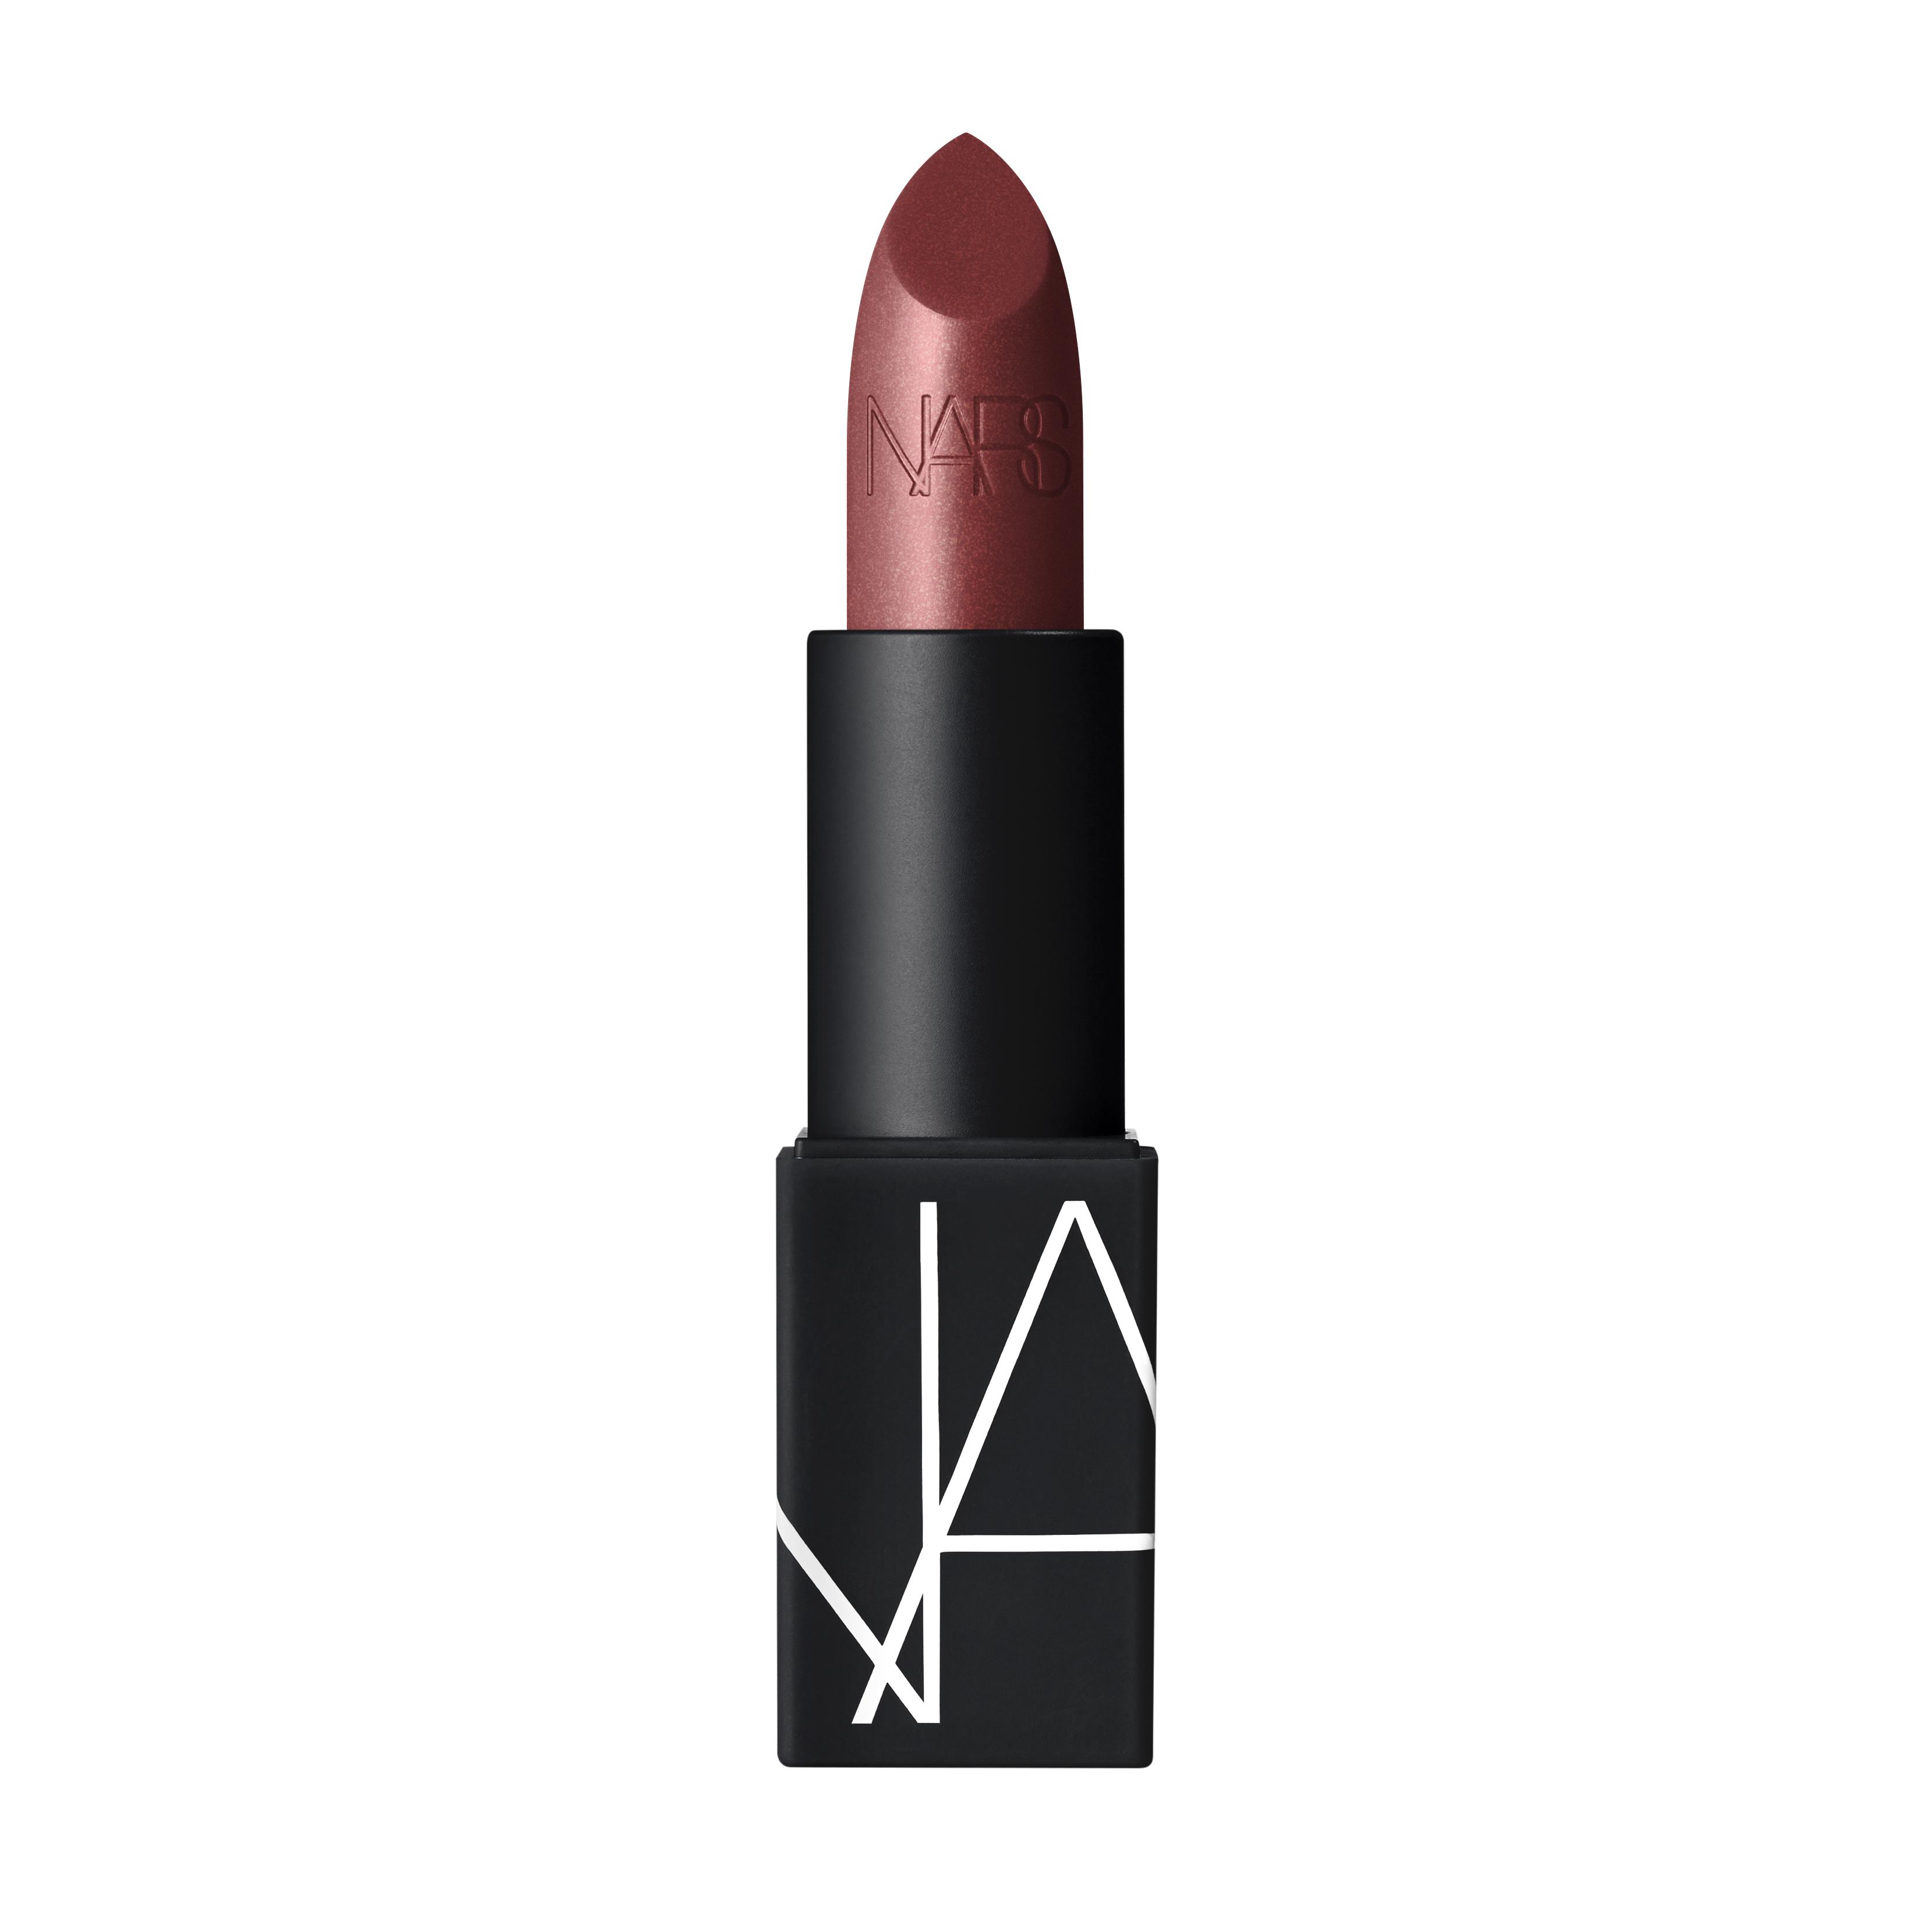 NARS Dressed to Kill Satin Lipstick Product Image